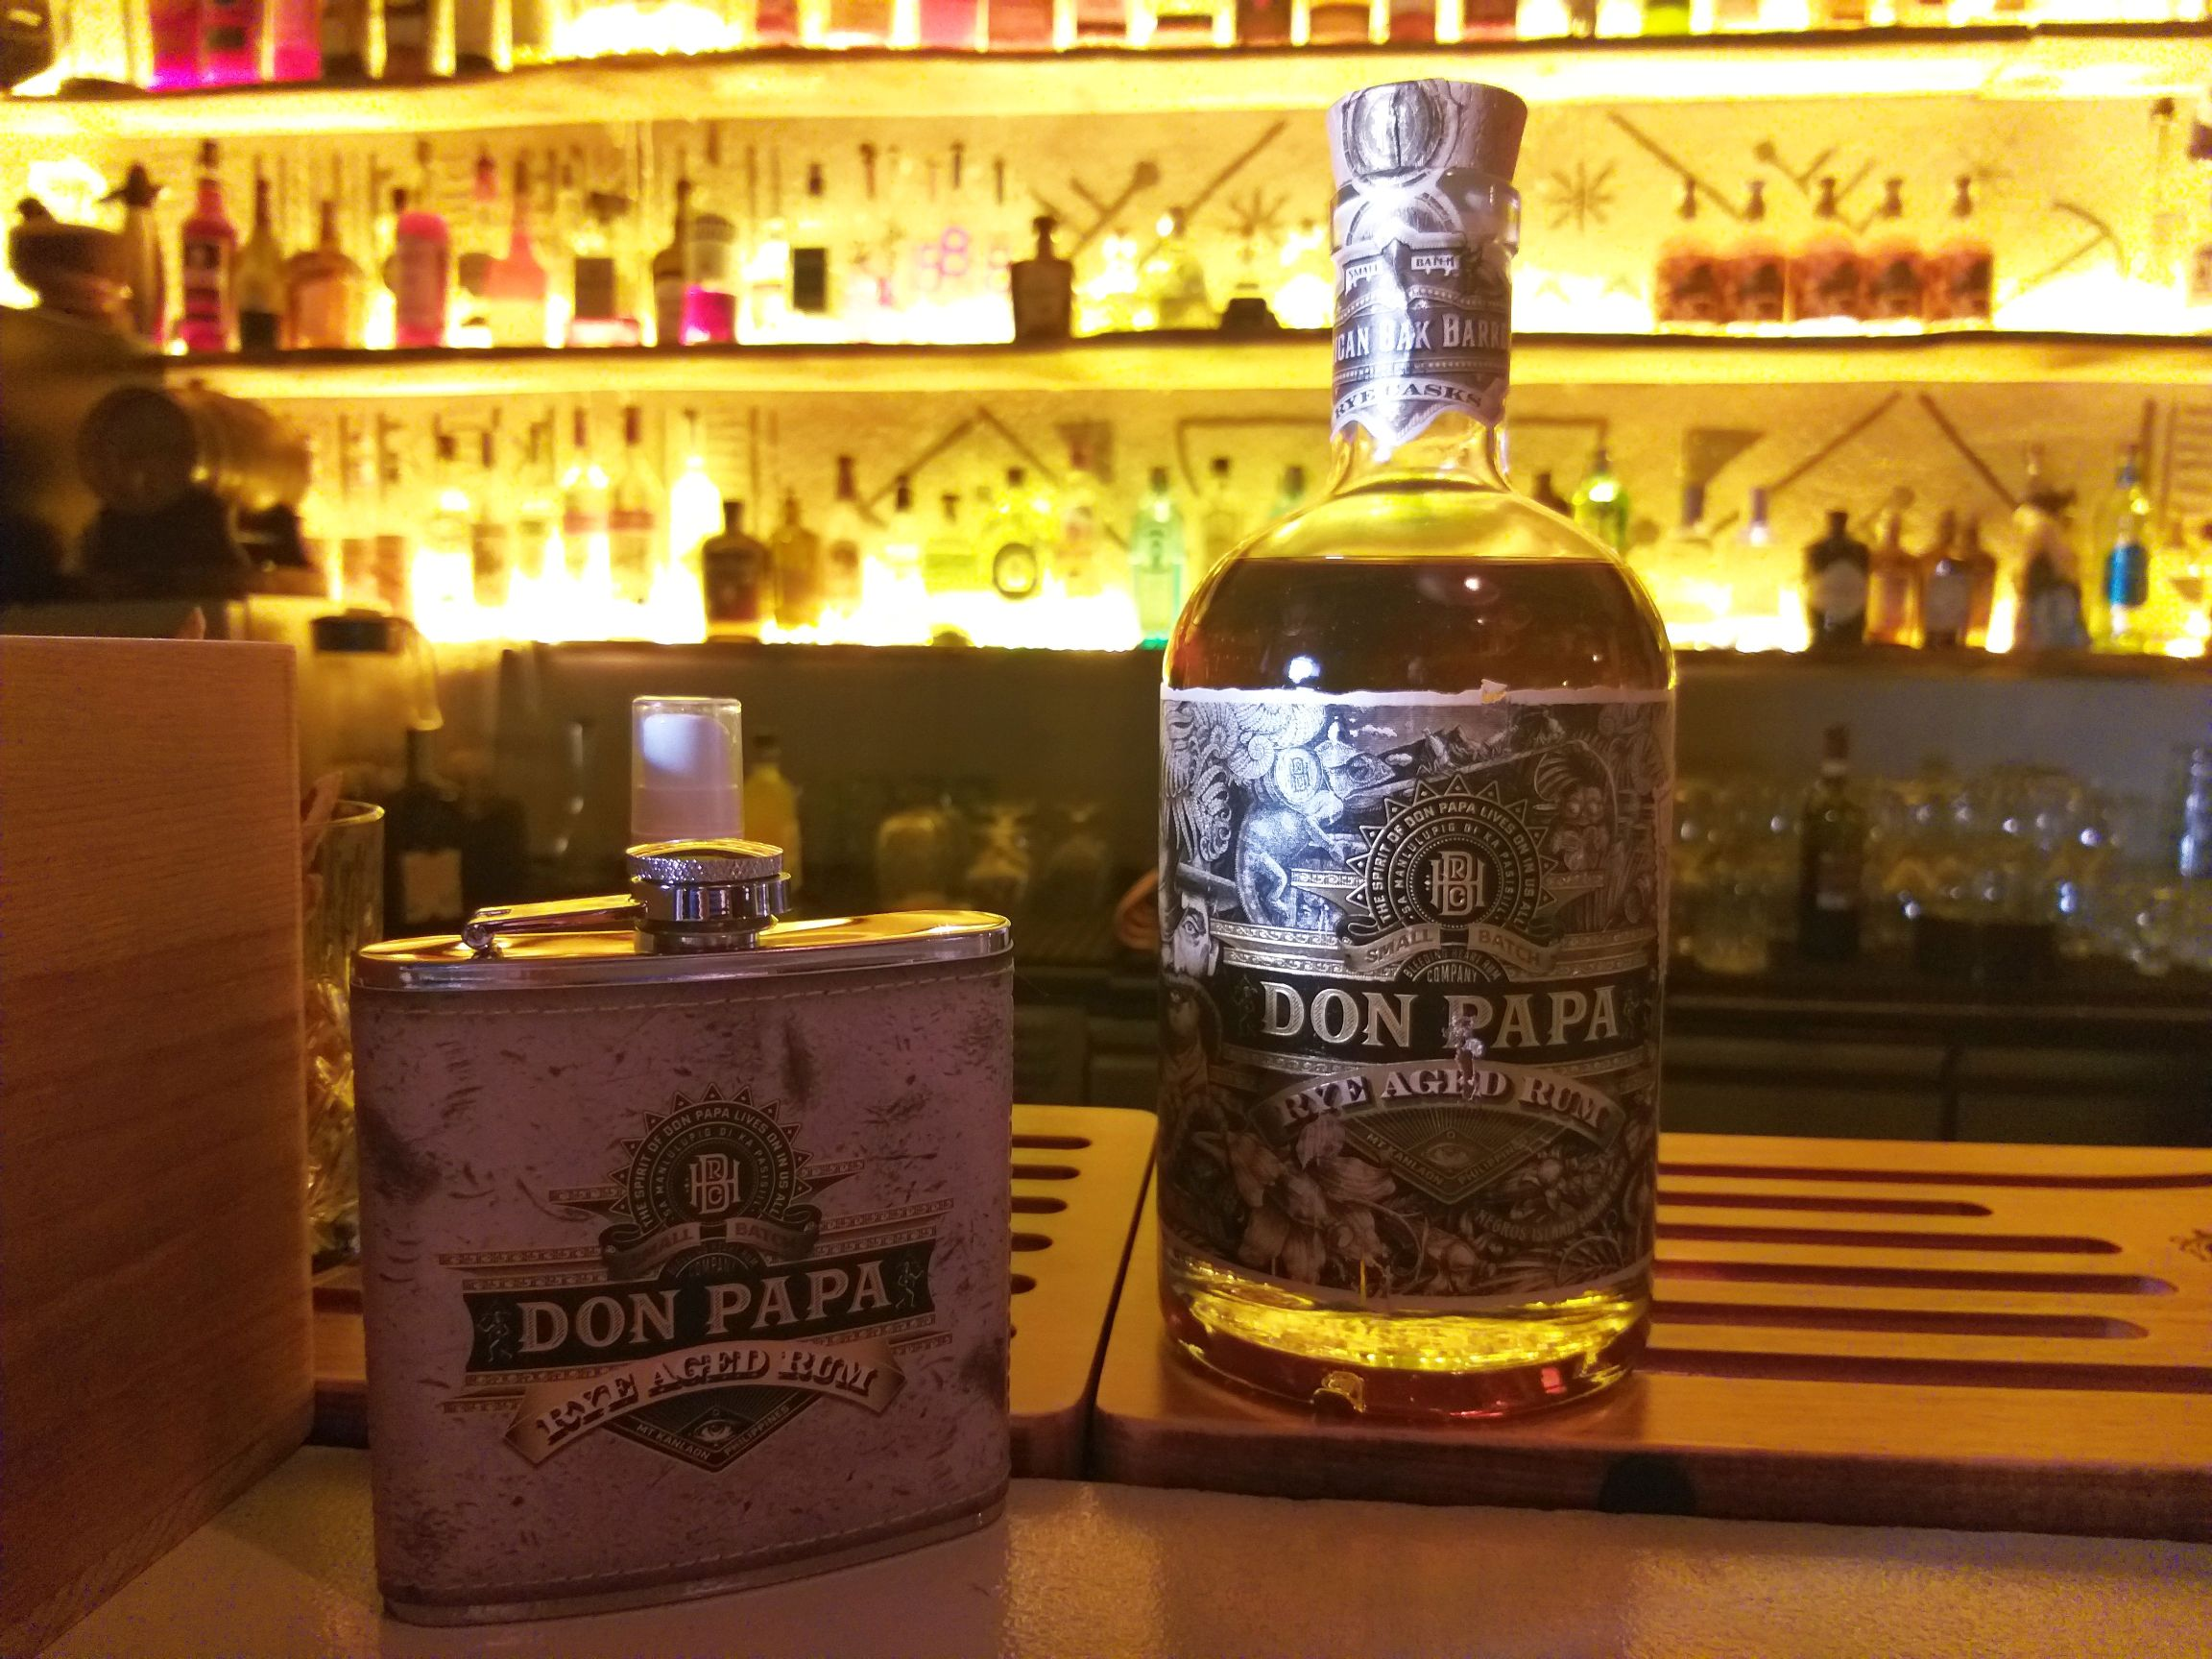 Don Papa presenta il nuovo Rye Aged Rum